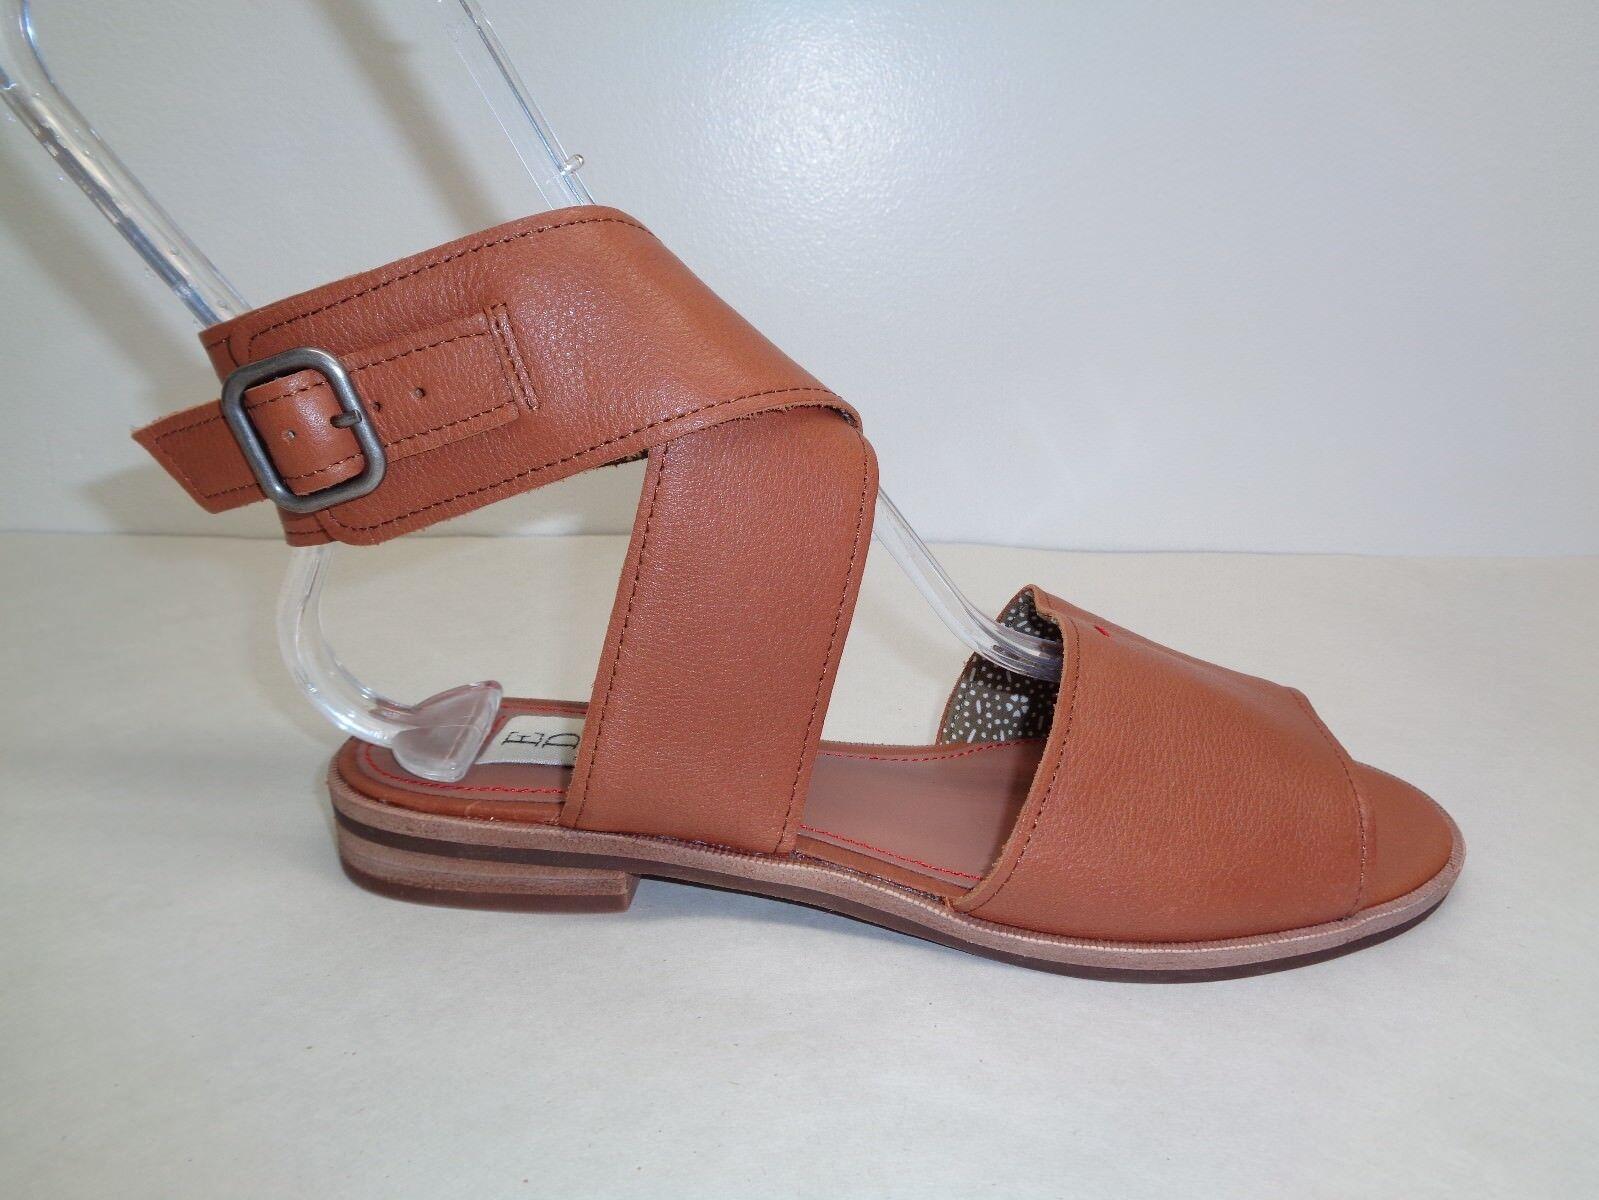 ED by Ellen Degeneres Größe 9 M SANJA Braun Braun Braun Leder Sandales New Damenschuhe Schuhes df241b